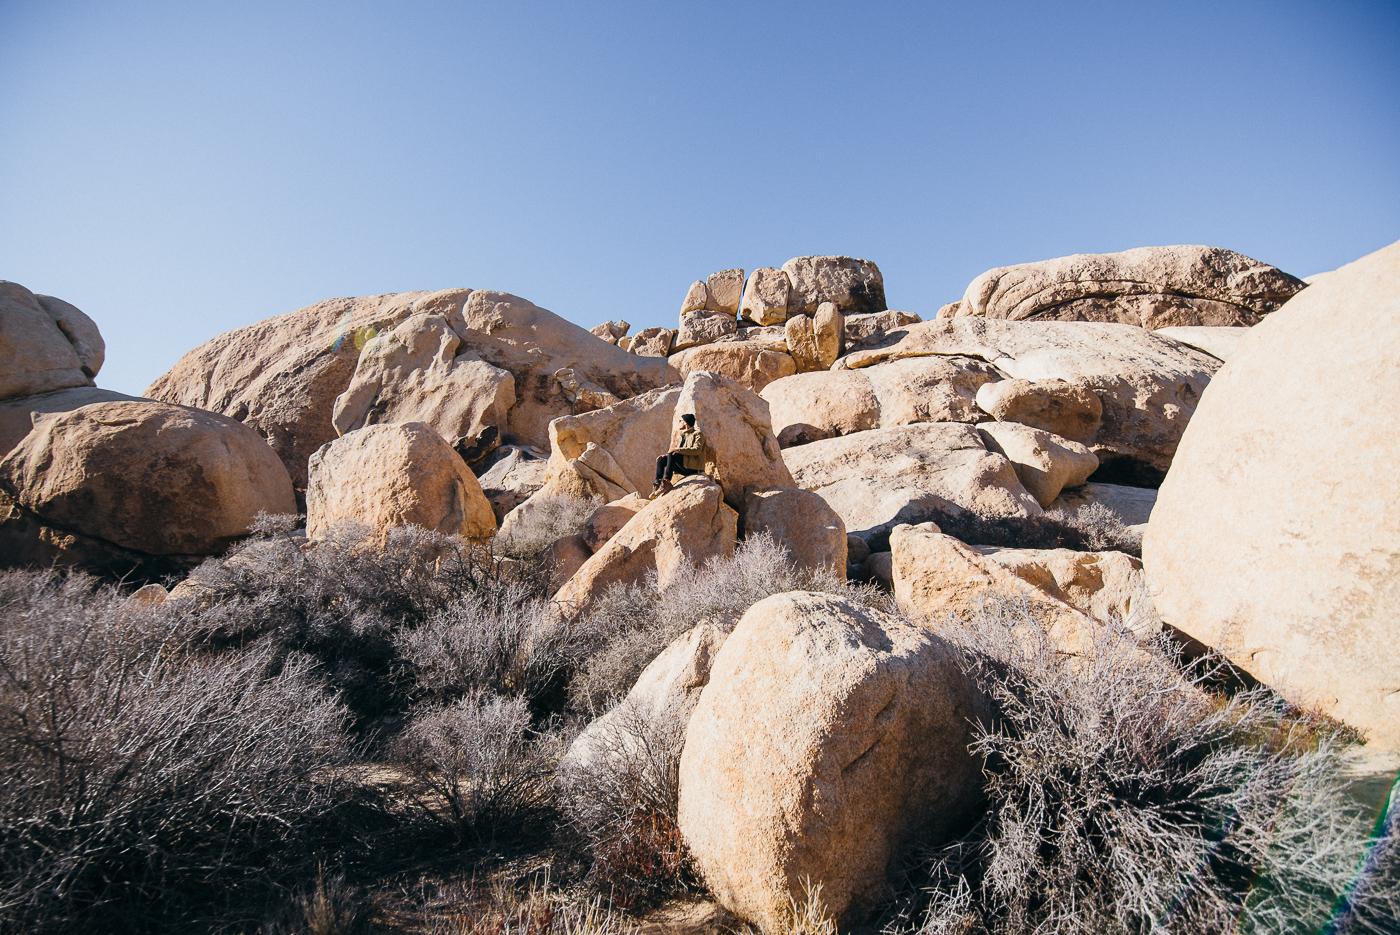 america yall jeremy pawlowski lauren simpson joshua tree national park california vsco camping boulders